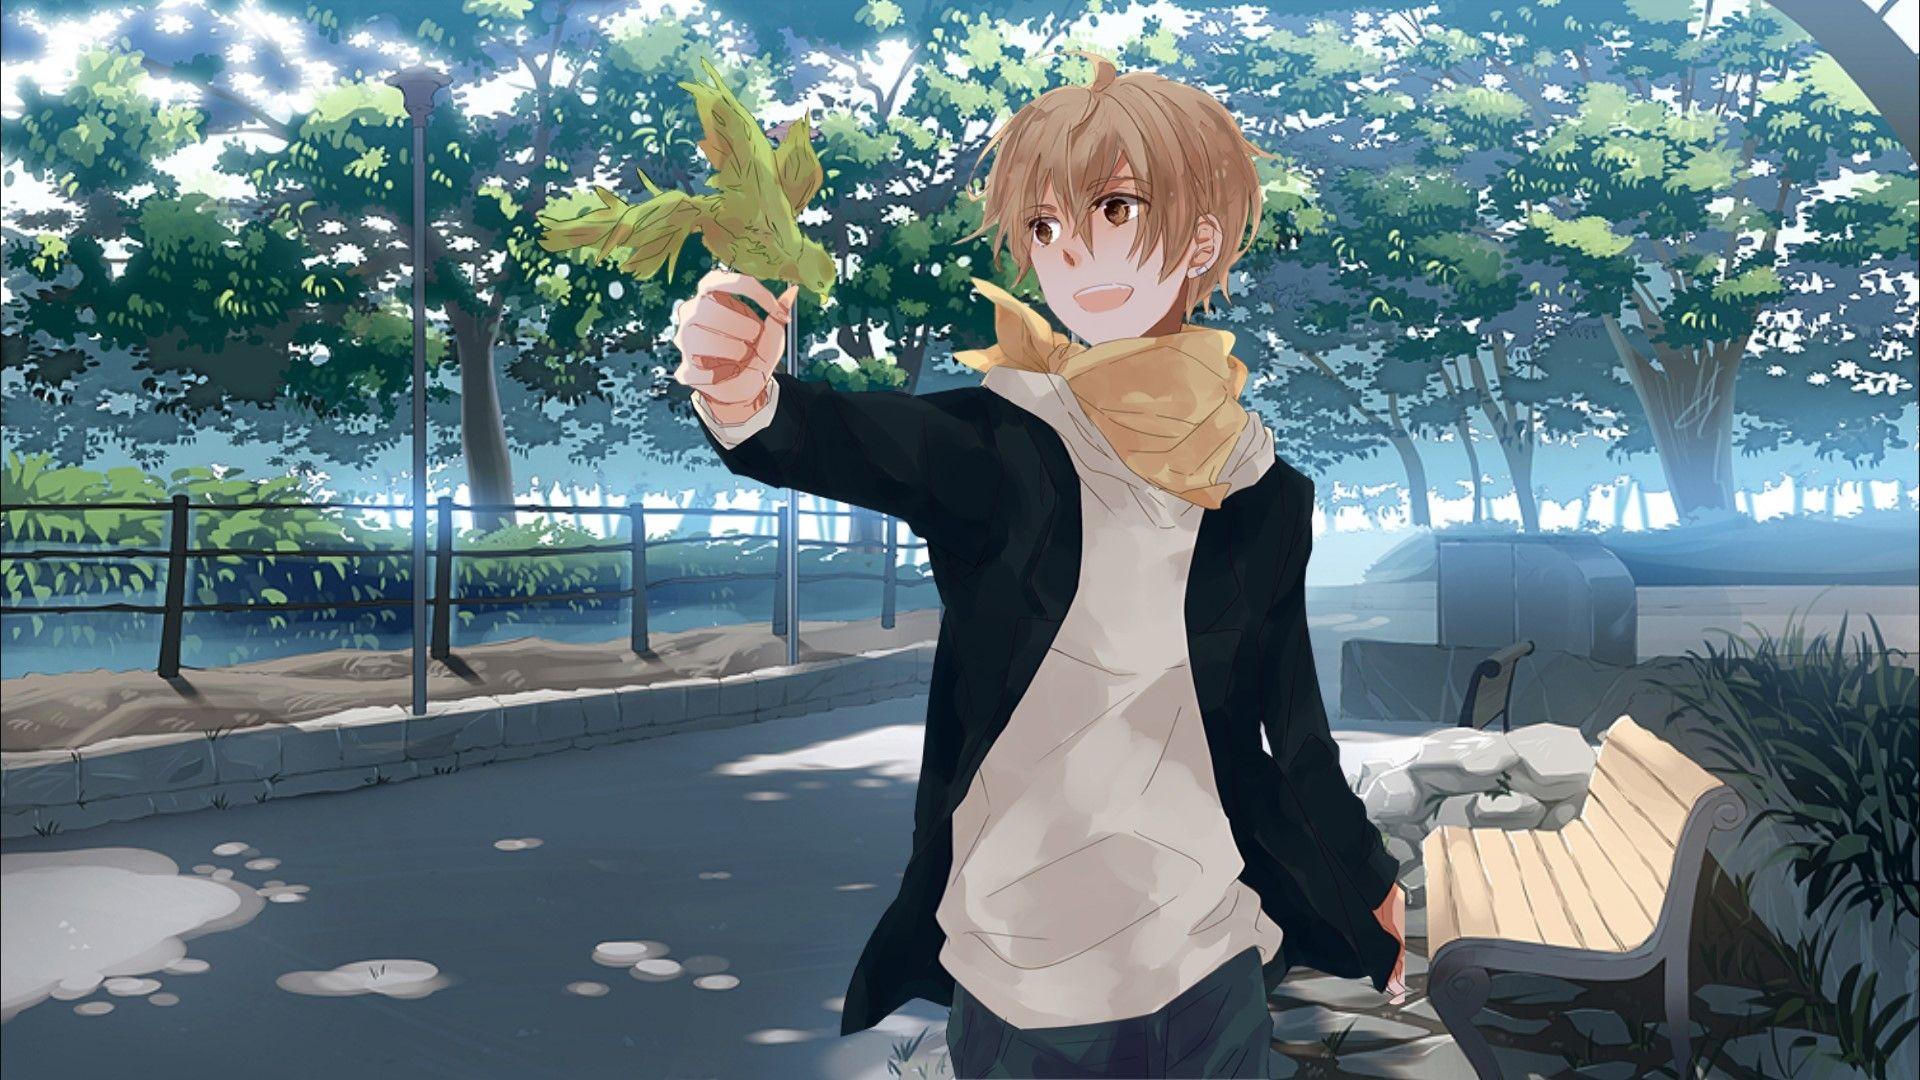 Handsome Anime Boy Images